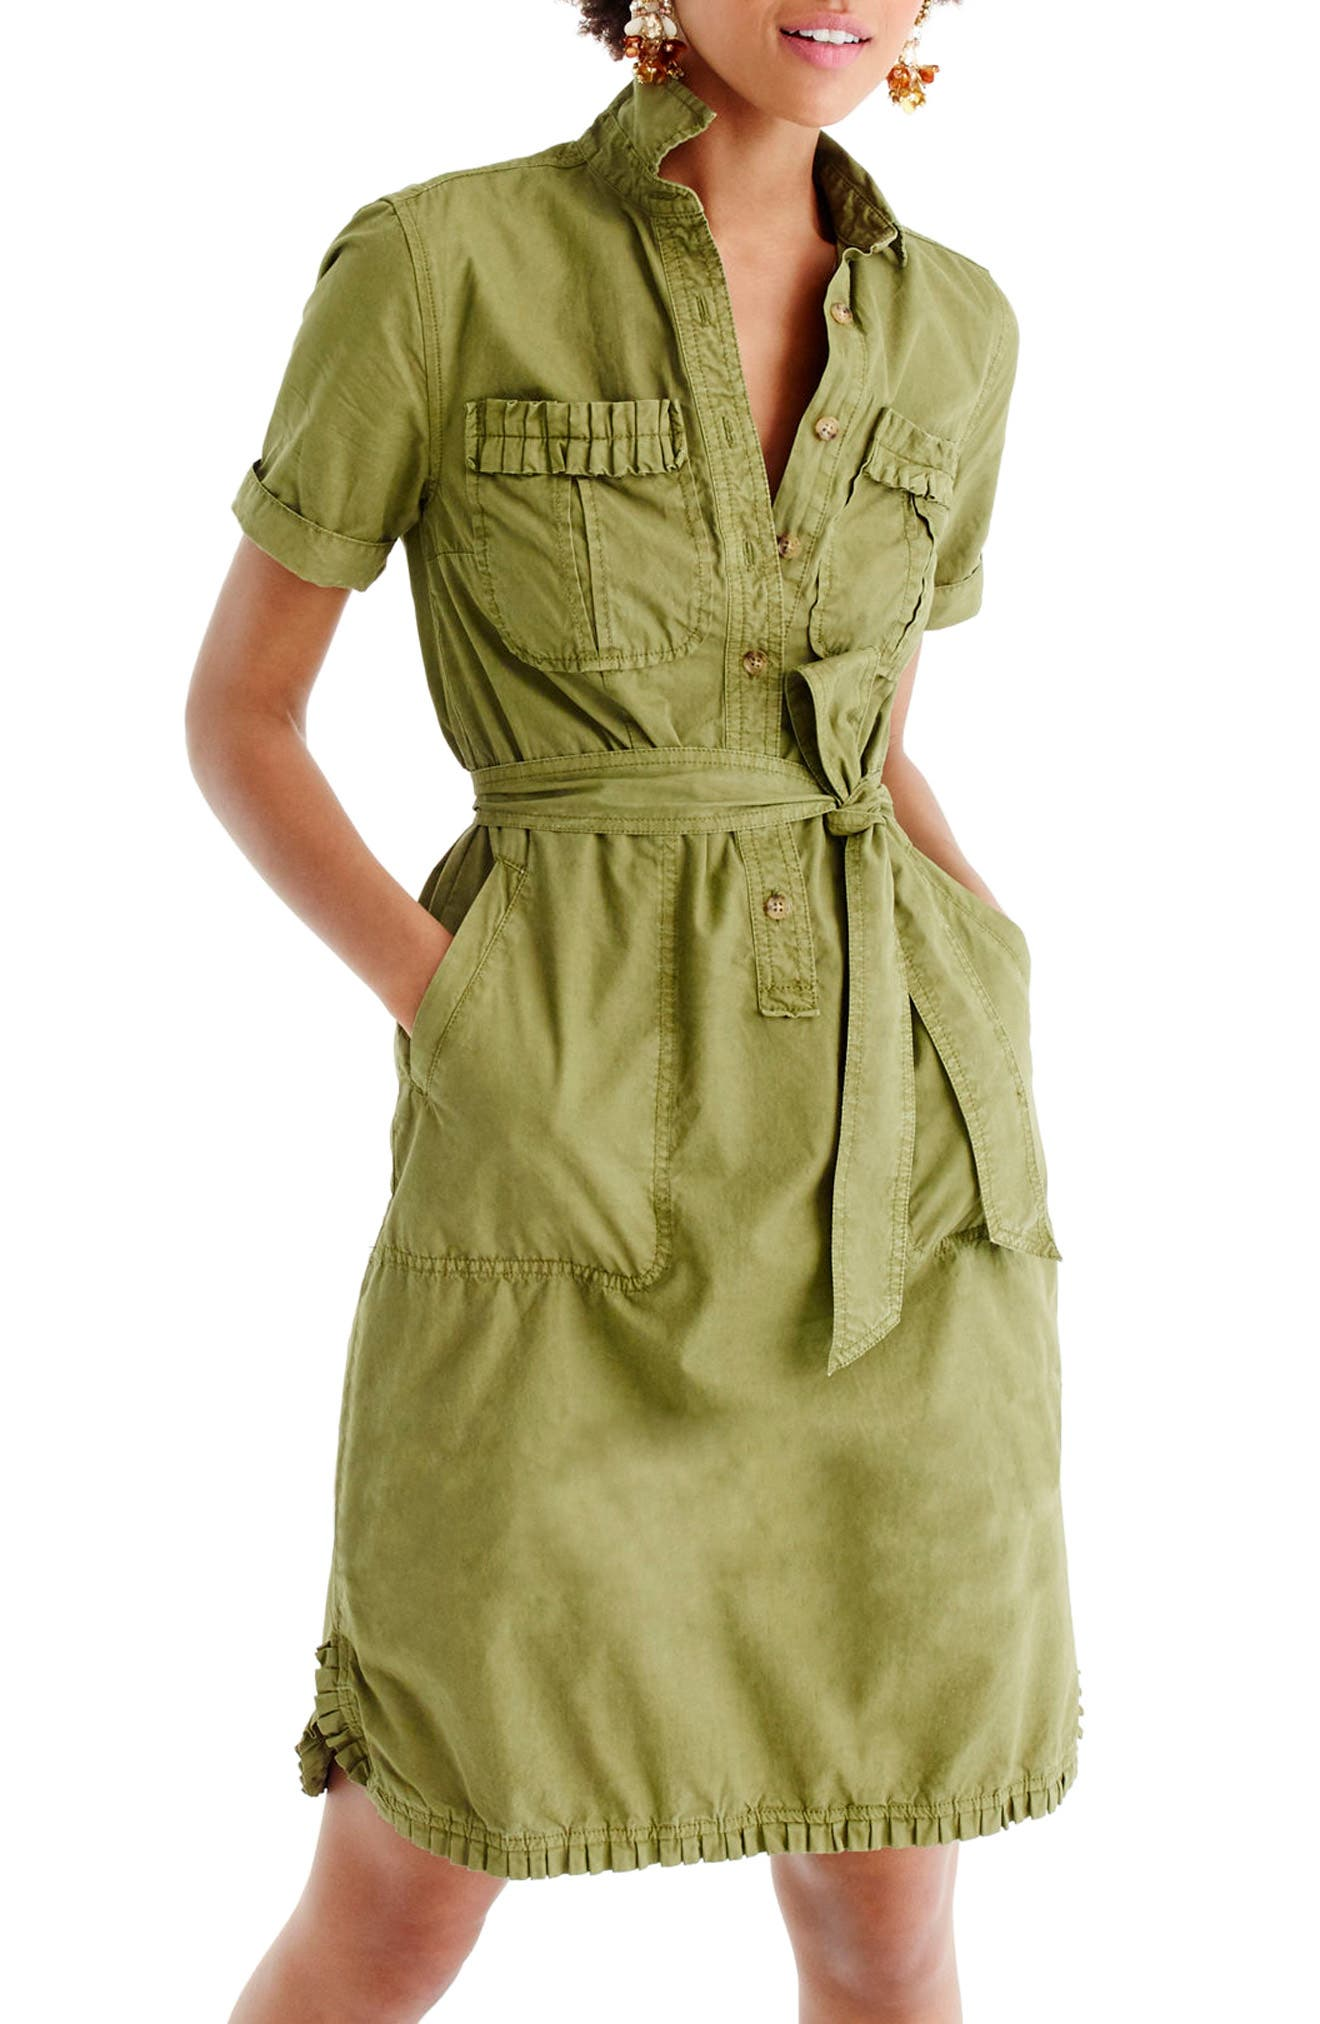 Alternate Image 1 Selected - J.Crew Ruffle Hem Utility Shirtdress (Regular & Petite)